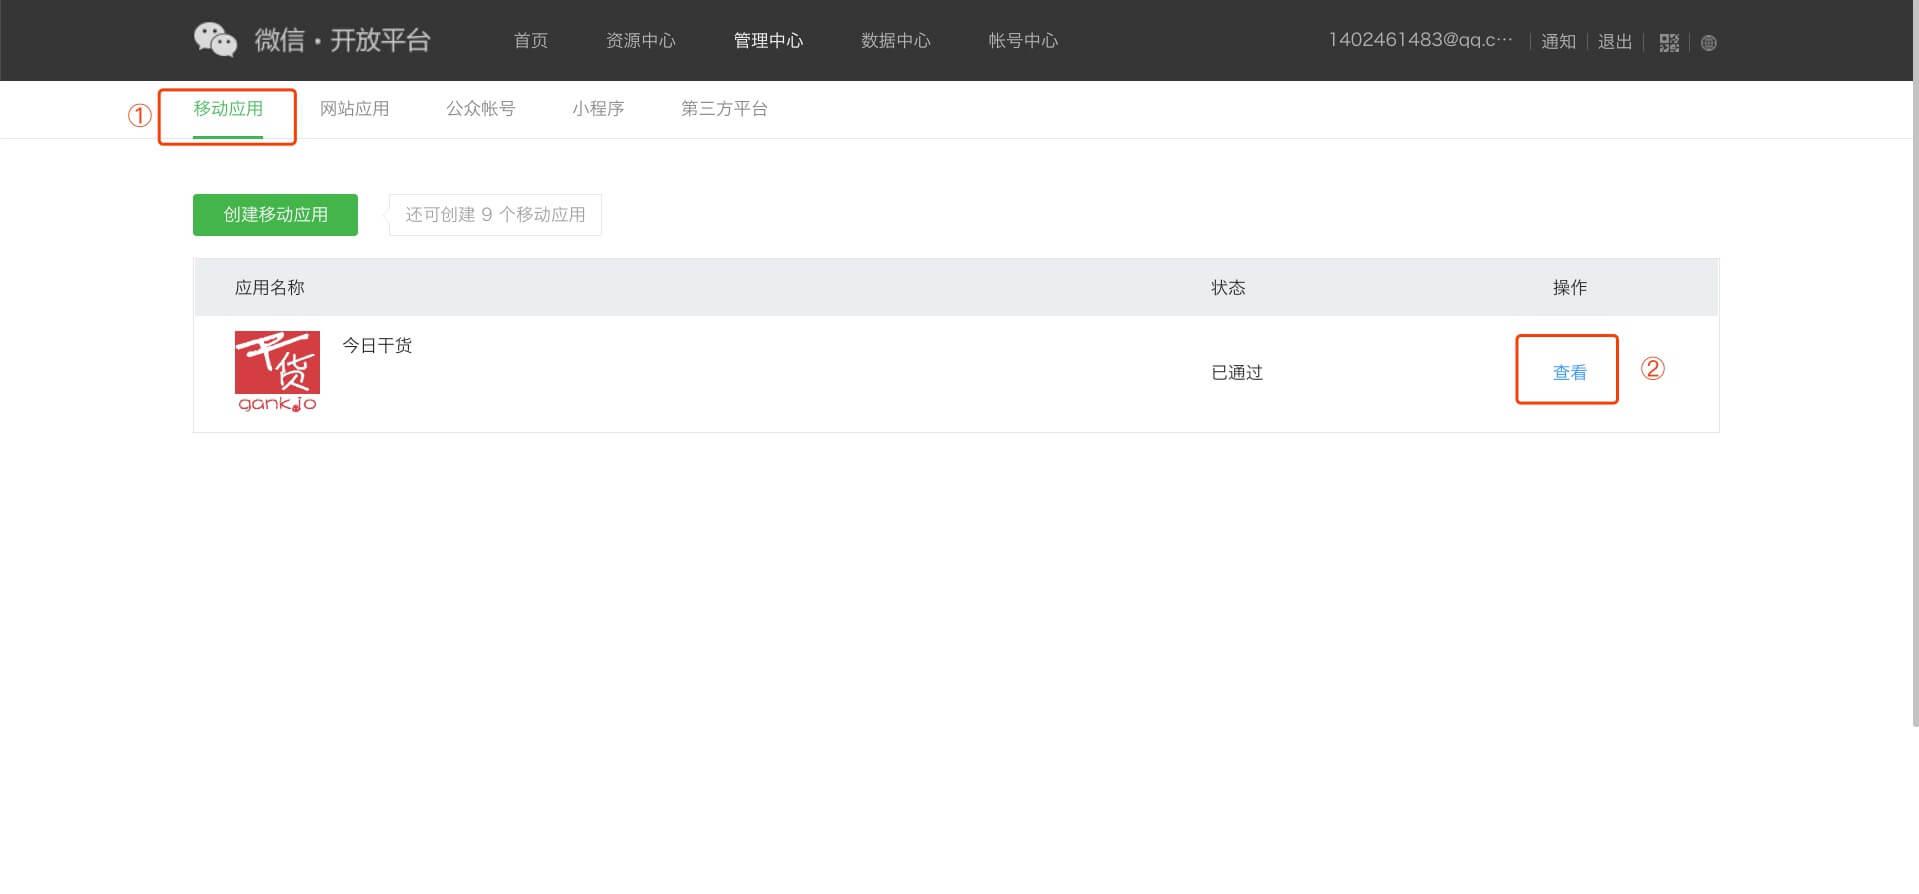 http://www.wangquanwei.com/wp-content/uploads/2019/10/1571104946-C5E01E59-768E-4997-B7D0-3A52D83E74B3.jpeg